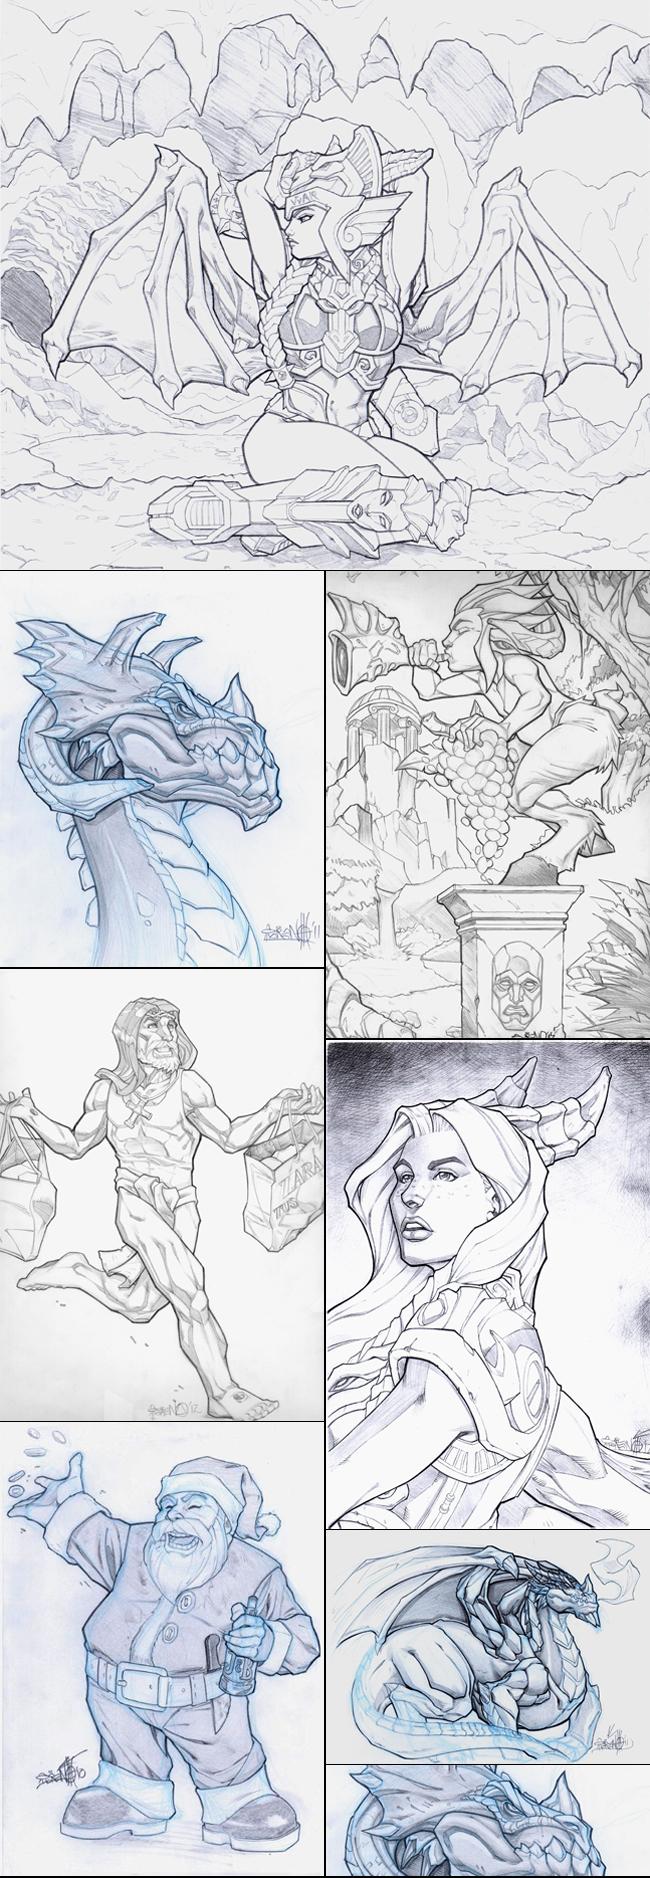 comic-raul-moreno-arte-digital-dibujo-madrid-academiac10